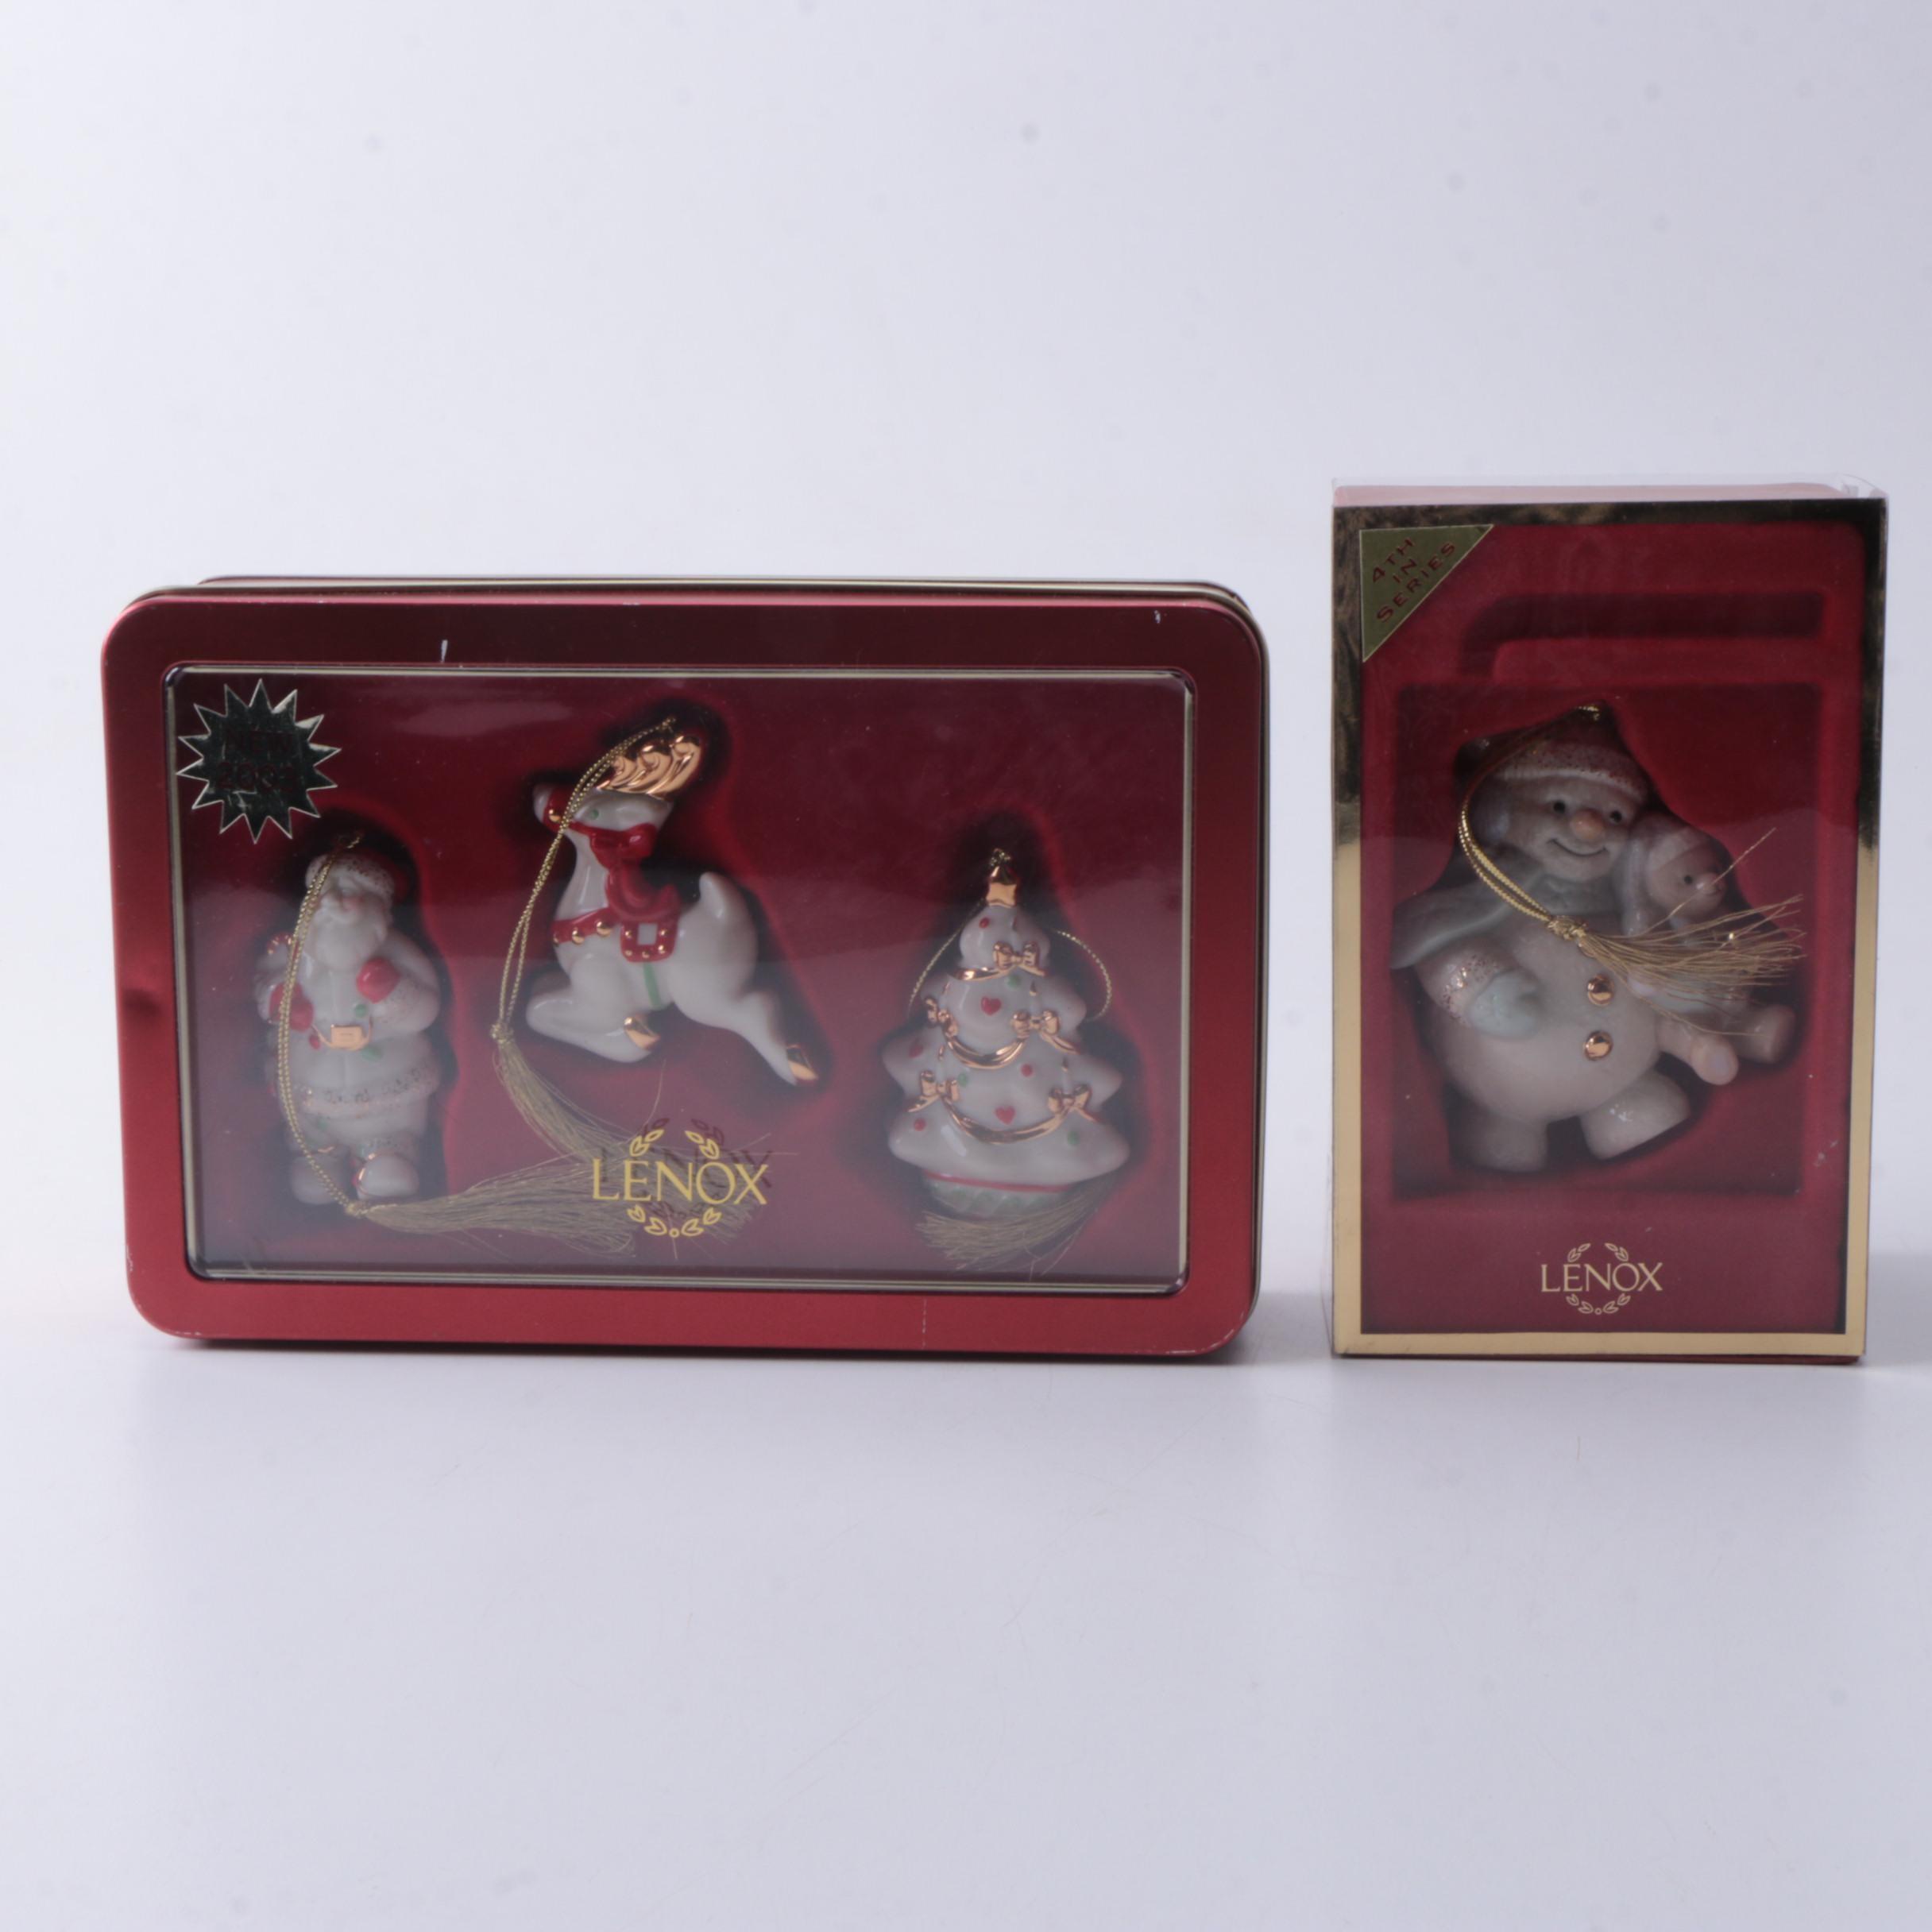 Lenox Porcelain Ornaments